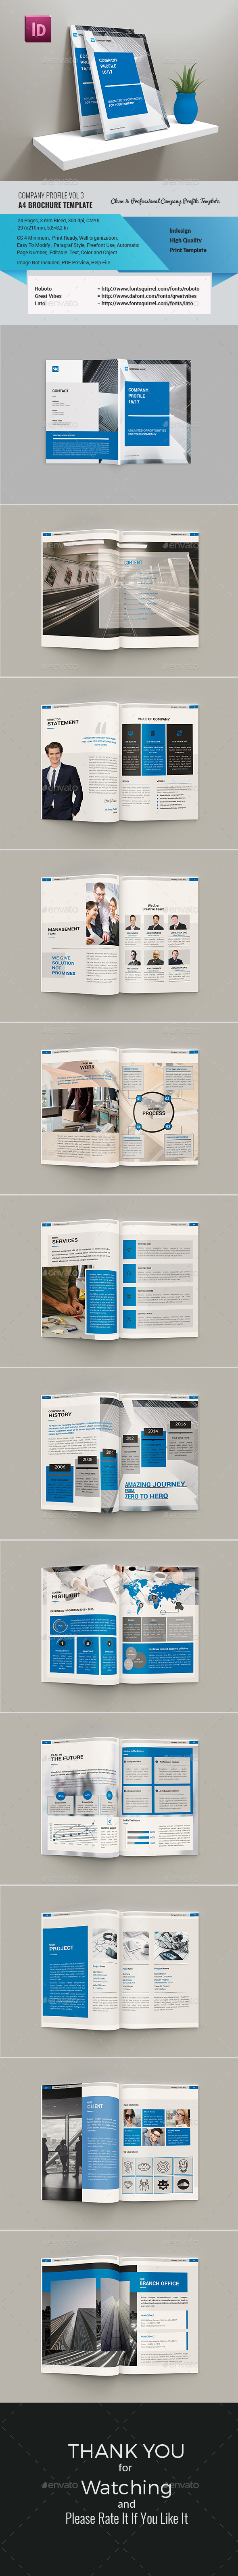 Company Profile Vol 3 - Corporate Brochures